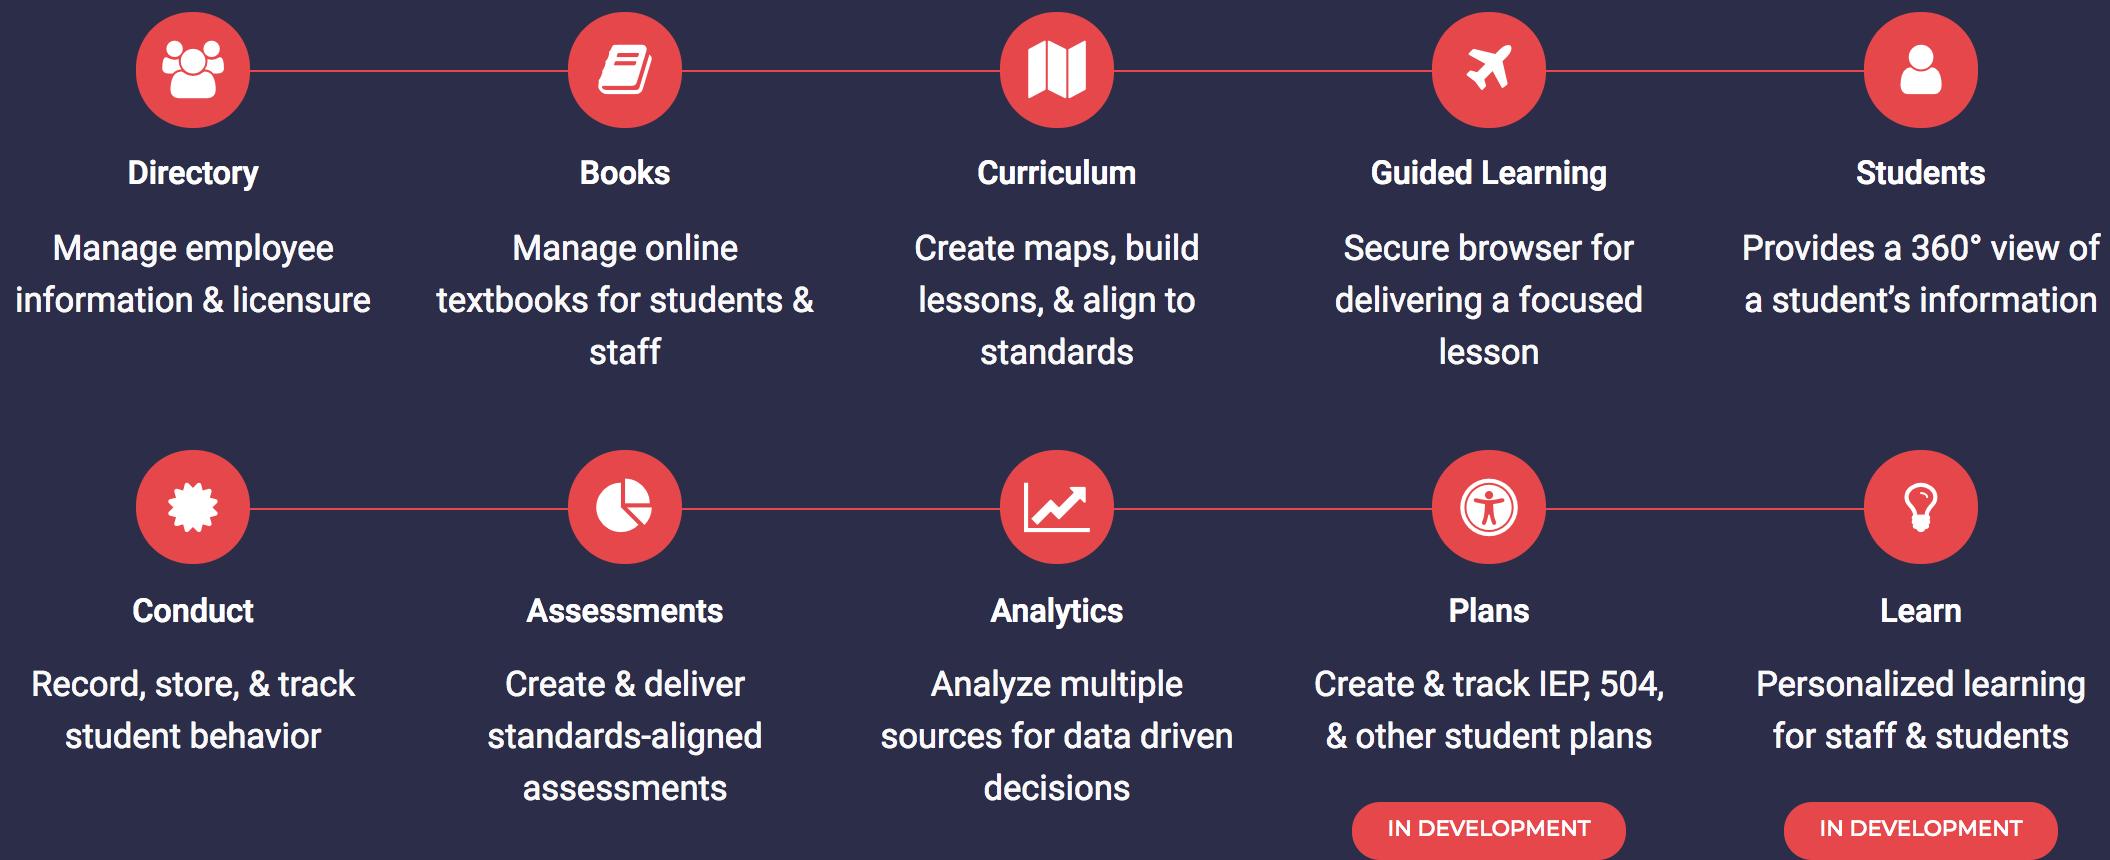 open source learning management system | open source platform software for education